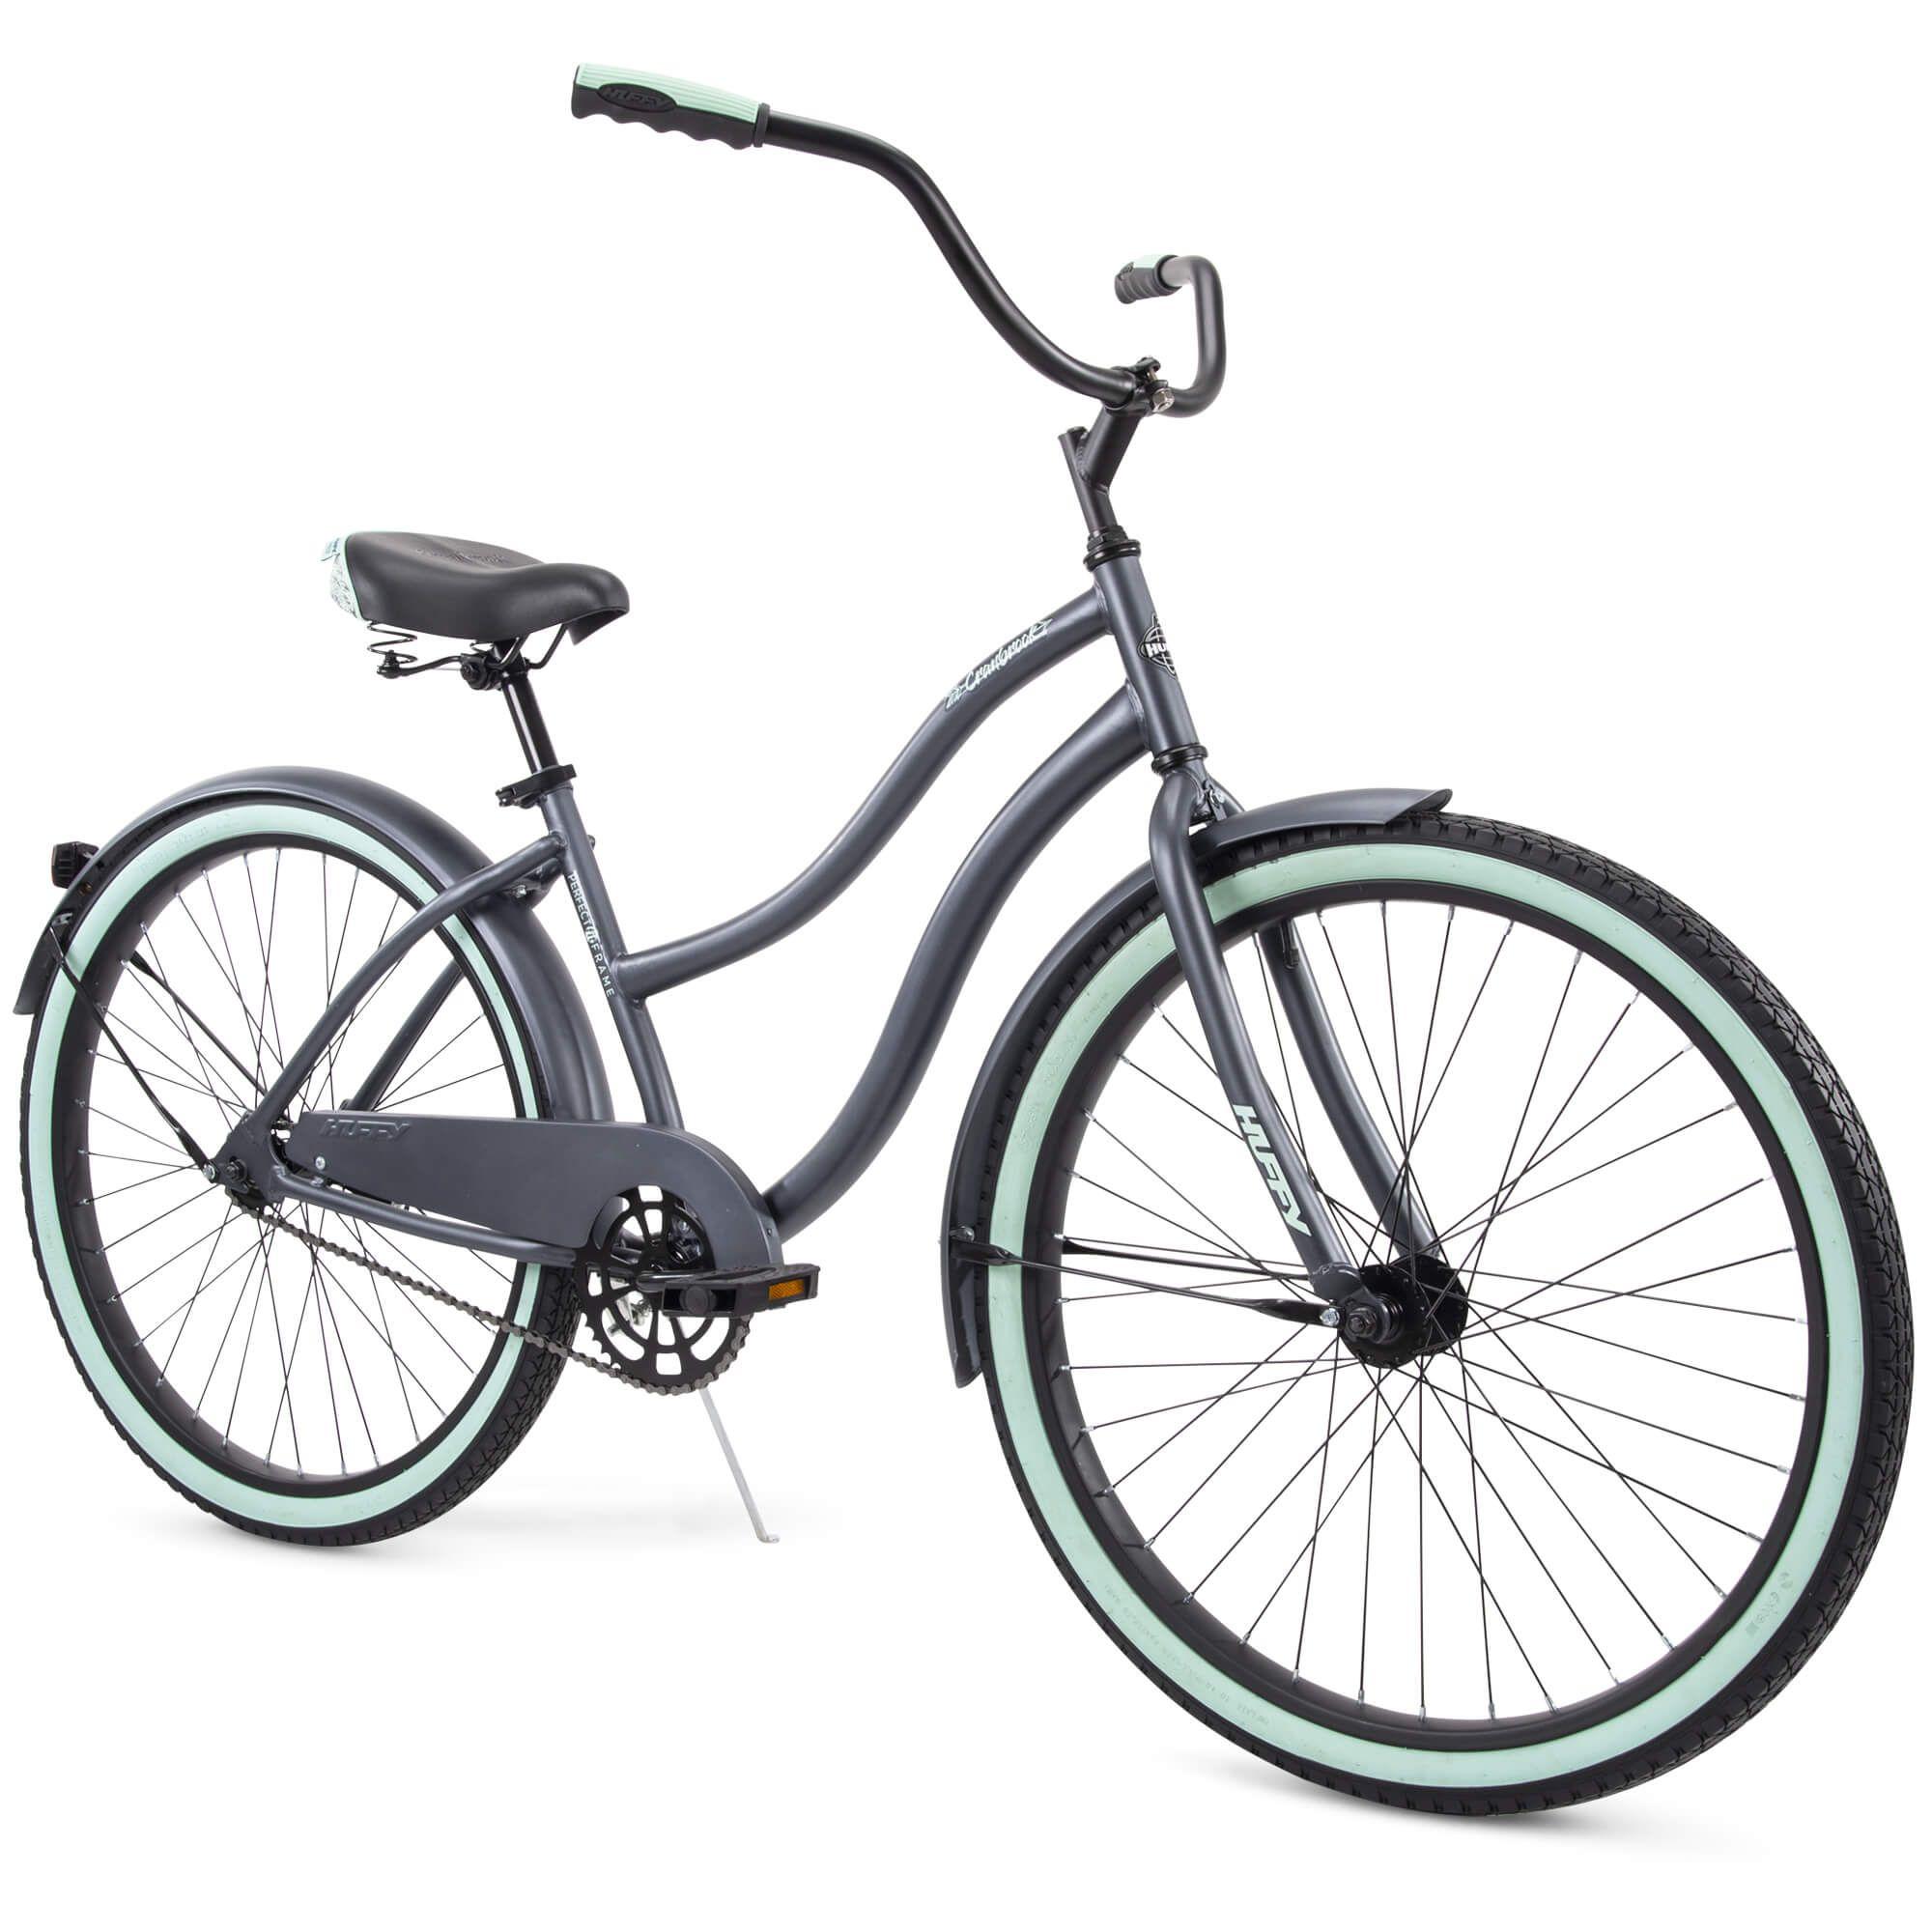 Free 2 Day Shipping Buy Huffy 26 Cranbrook Women S Comfort Cruiser Bike Gray At Walmart Com In 2020 Cruiser Bike Huffy Comfort Bike